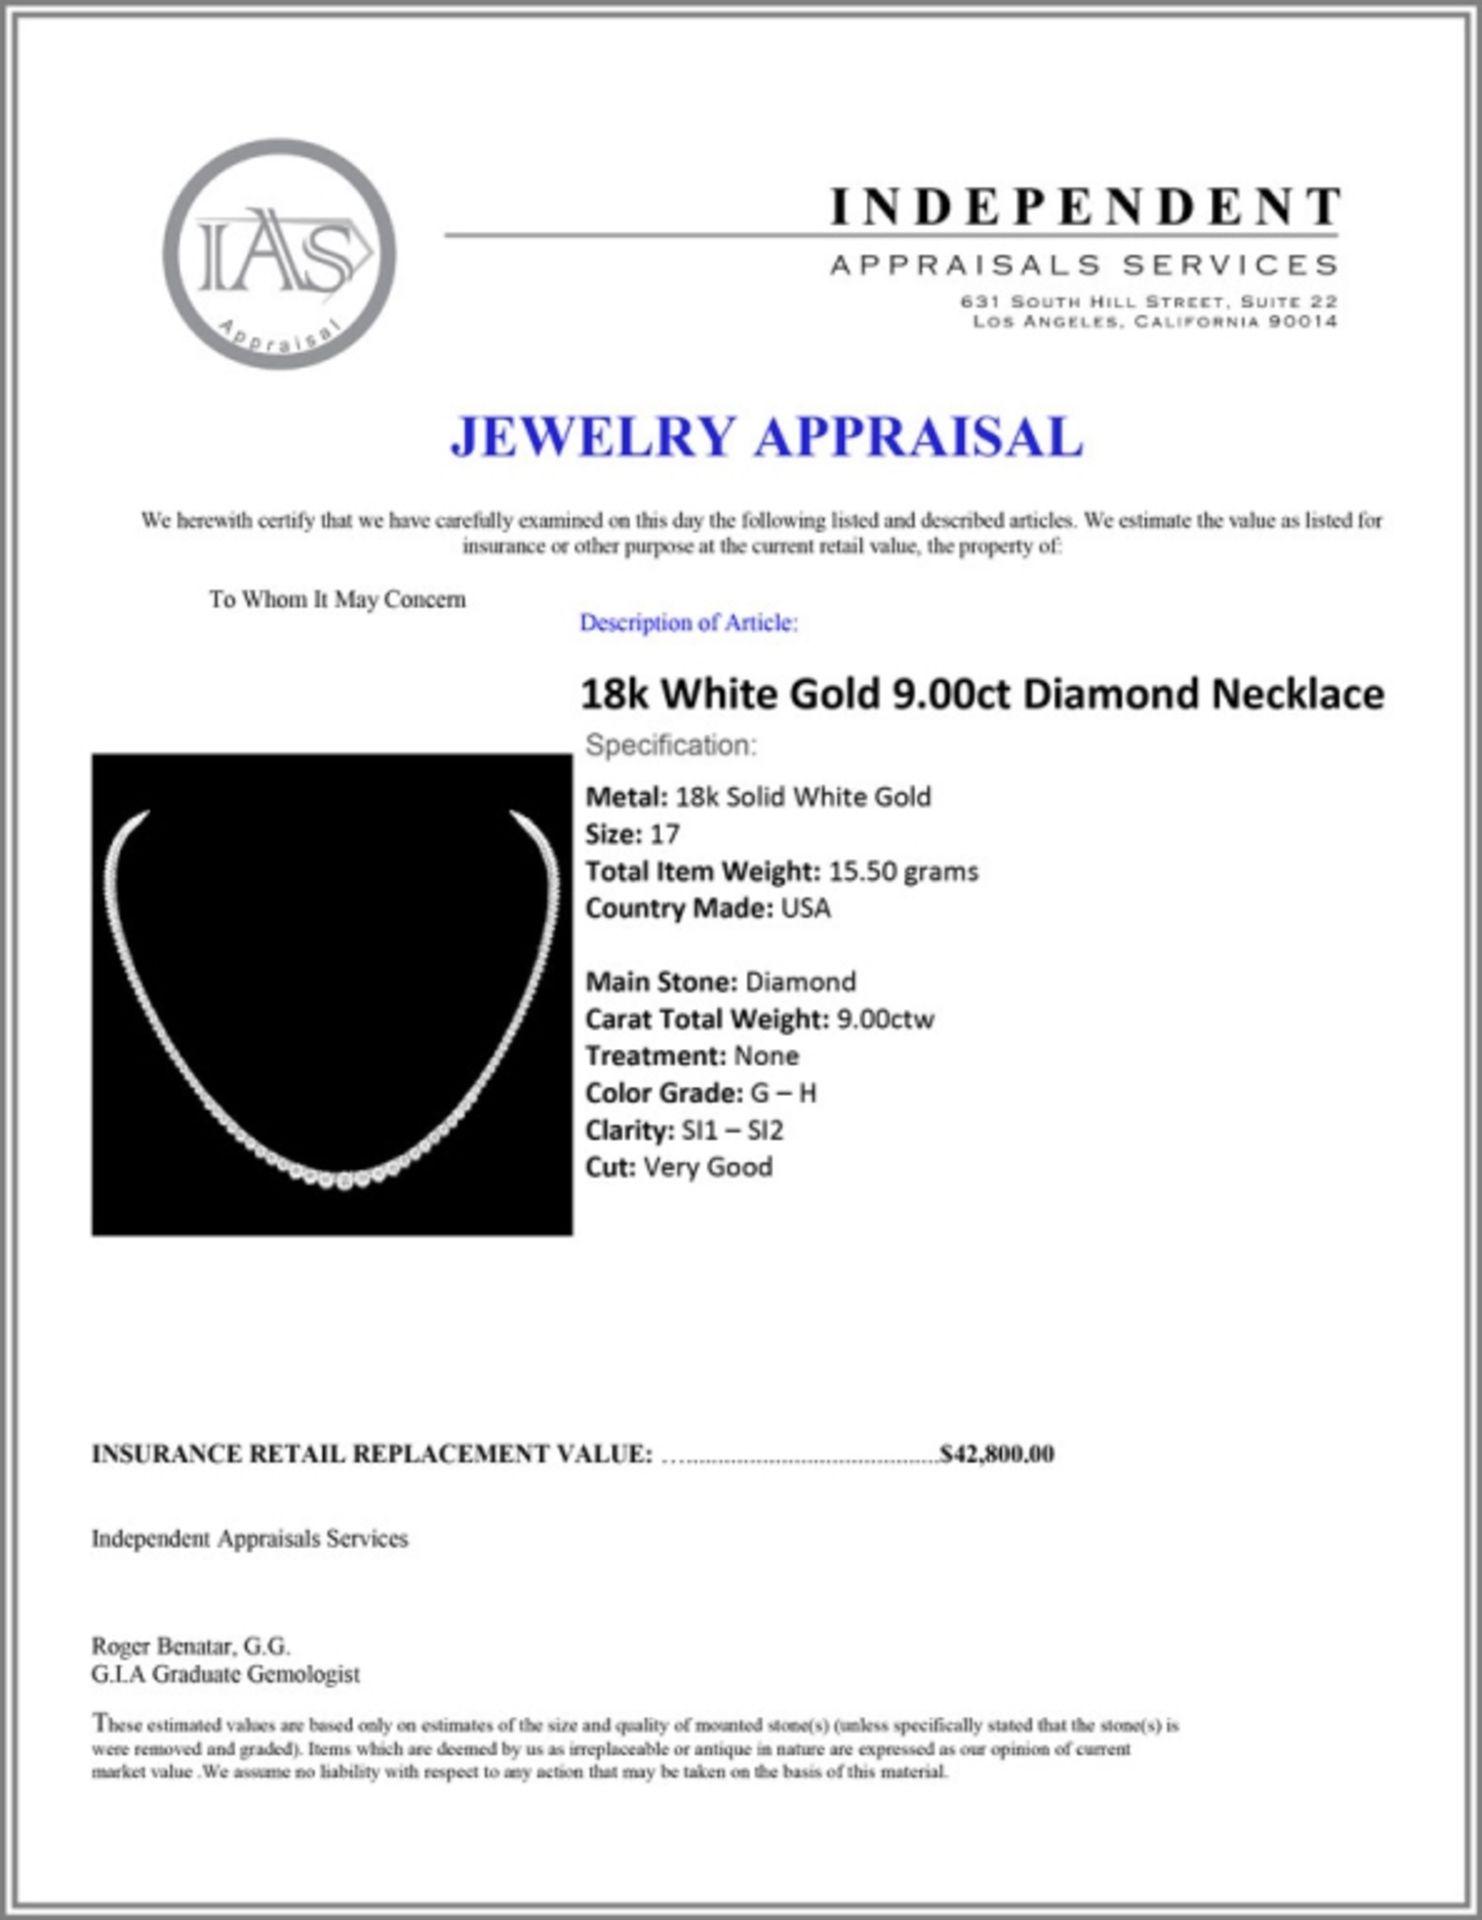 18k White Gold 9.00ct Diamond Necklace - Image 4 of 4